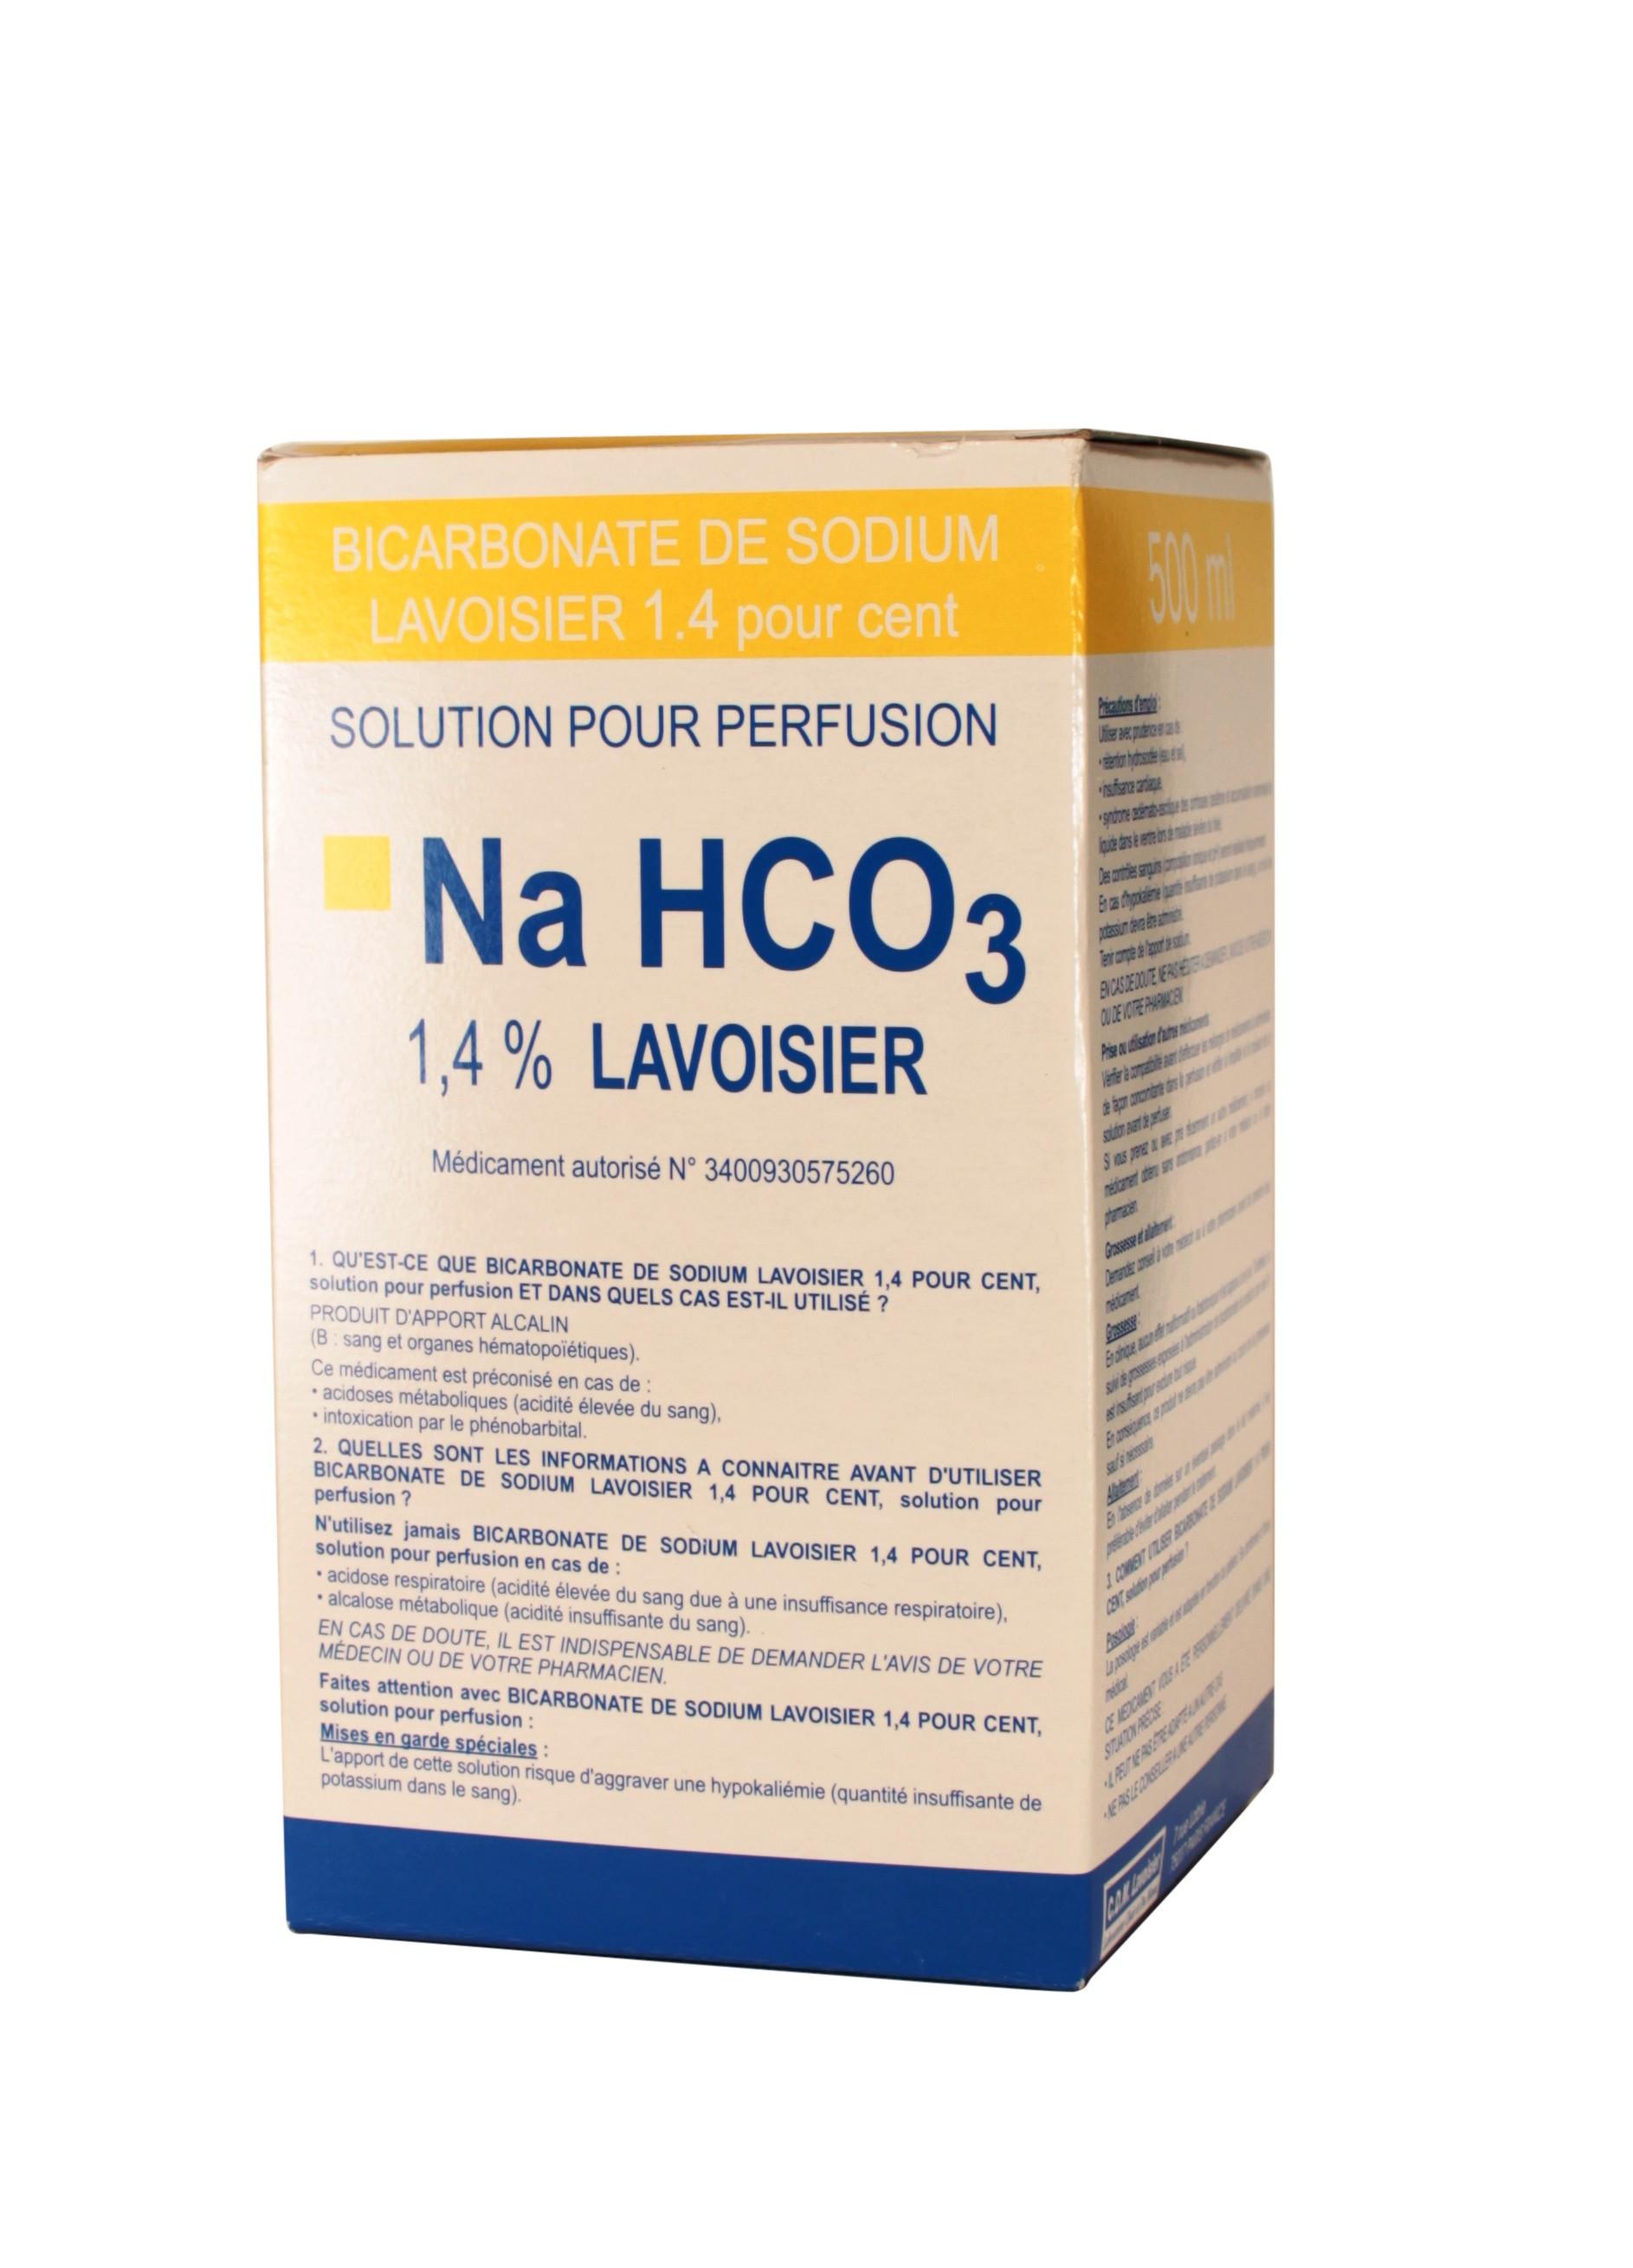 bicarbonate de sodium lavoisier 1 4 500ml pharmacie en. Black Bedroom Furniture Sets. Home Design Ideas